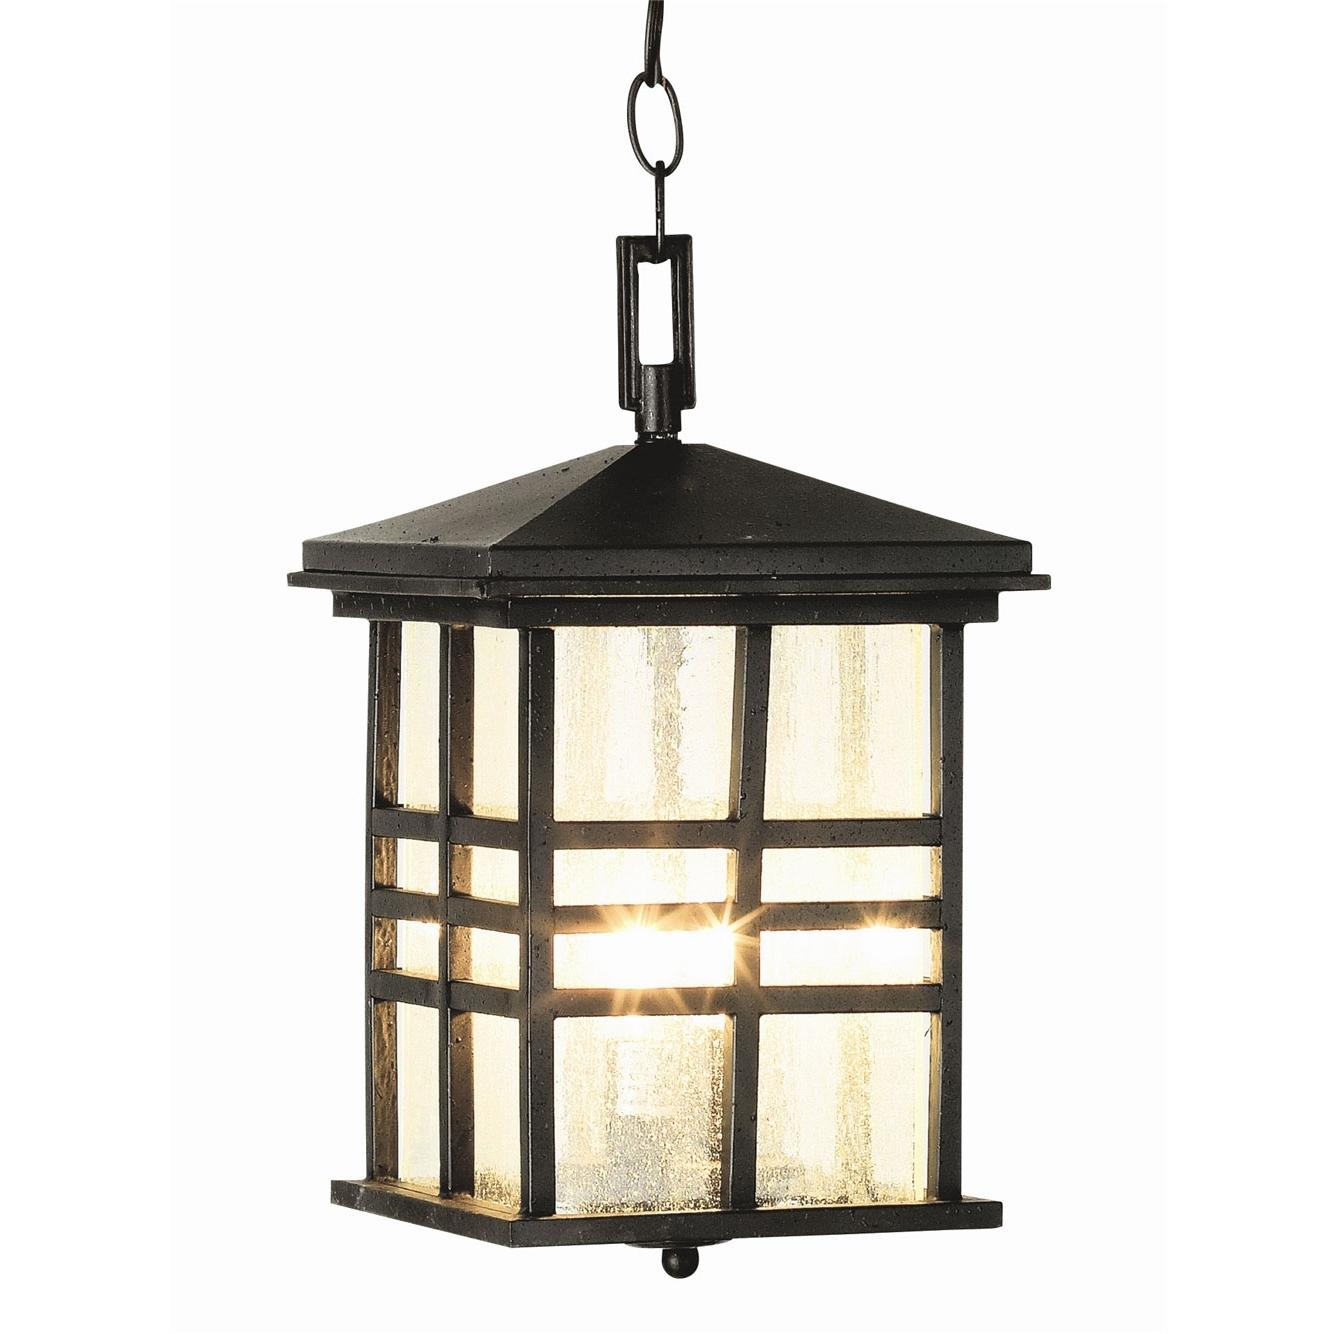 Current Rustic Craftsman Outdoor Hanging Lanterntrans Globe (View 7 of 20)